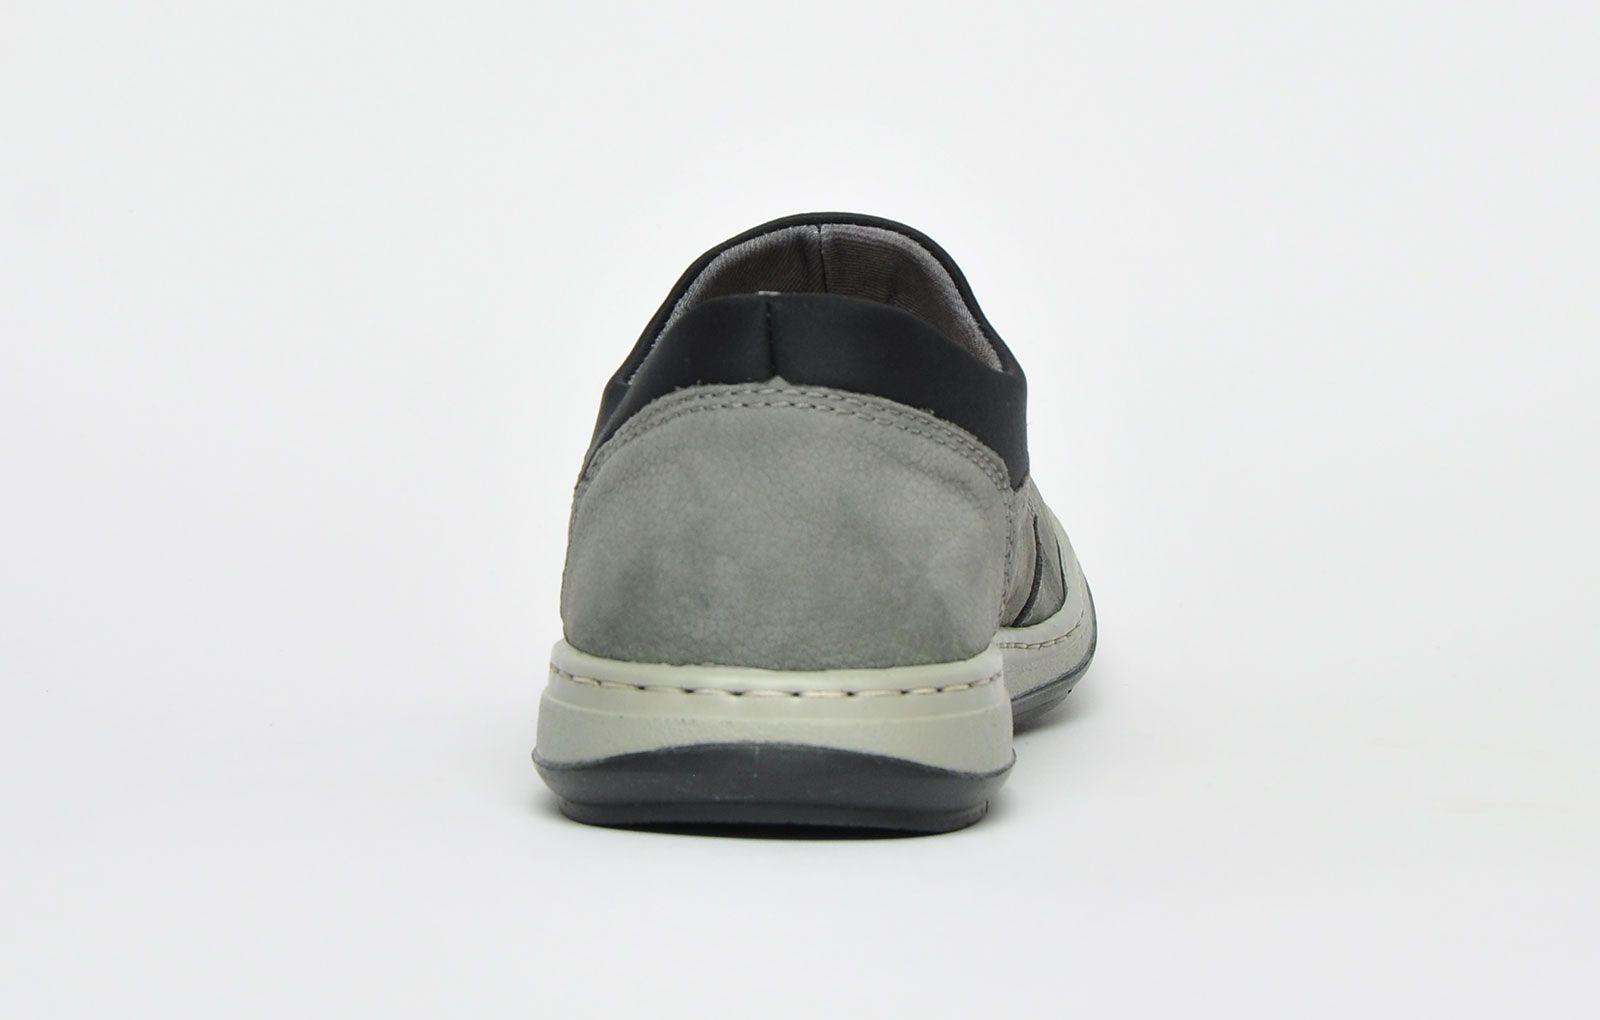 Rieker Comfort Slip On Mens Wide Fit